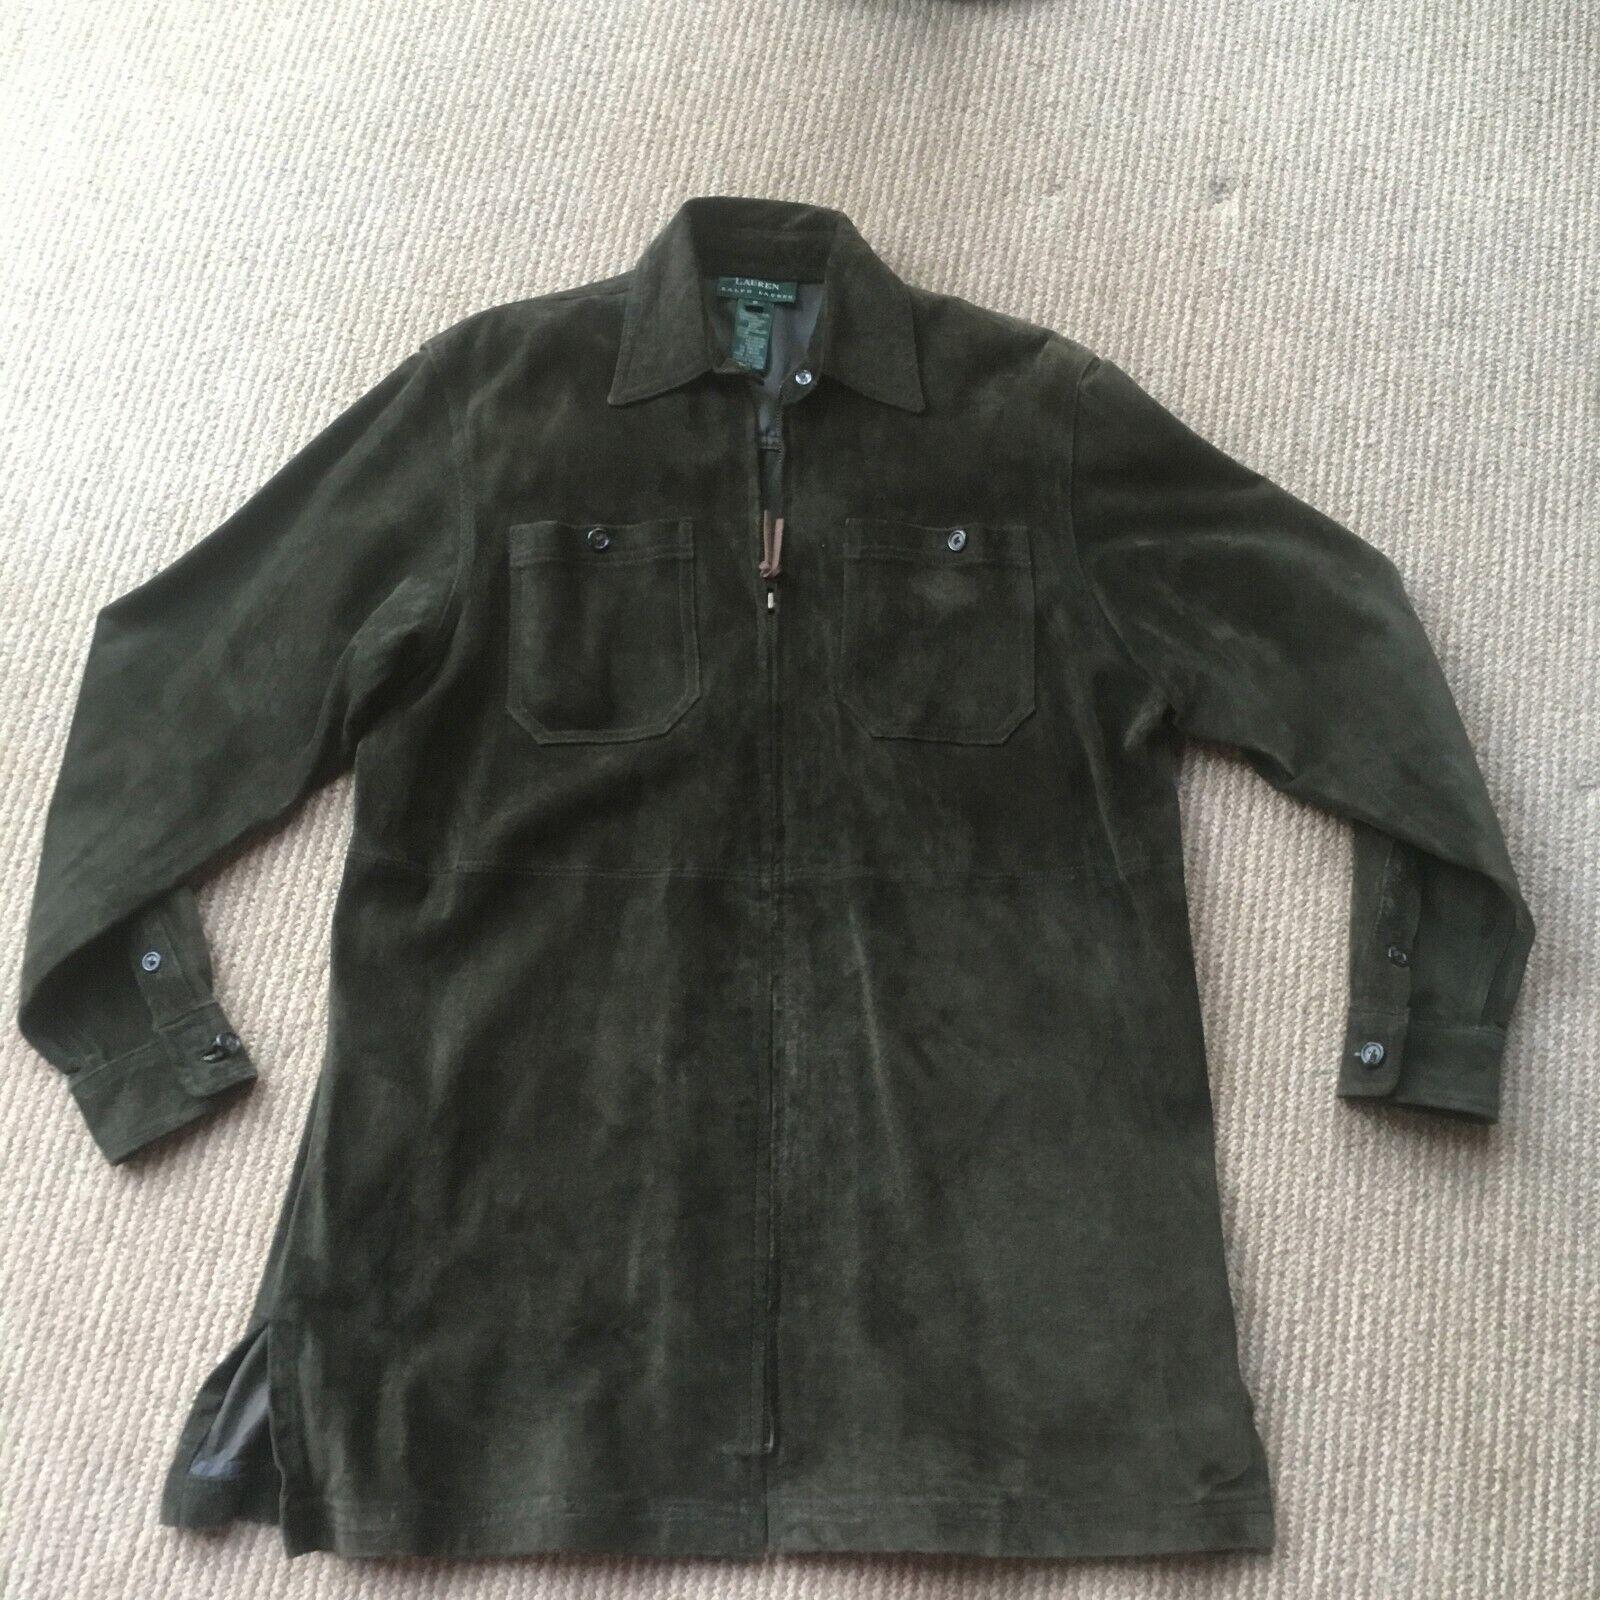 Vintage Ralph Lauren S Women's Suede leather Jacket. Olive Green. Zippered.